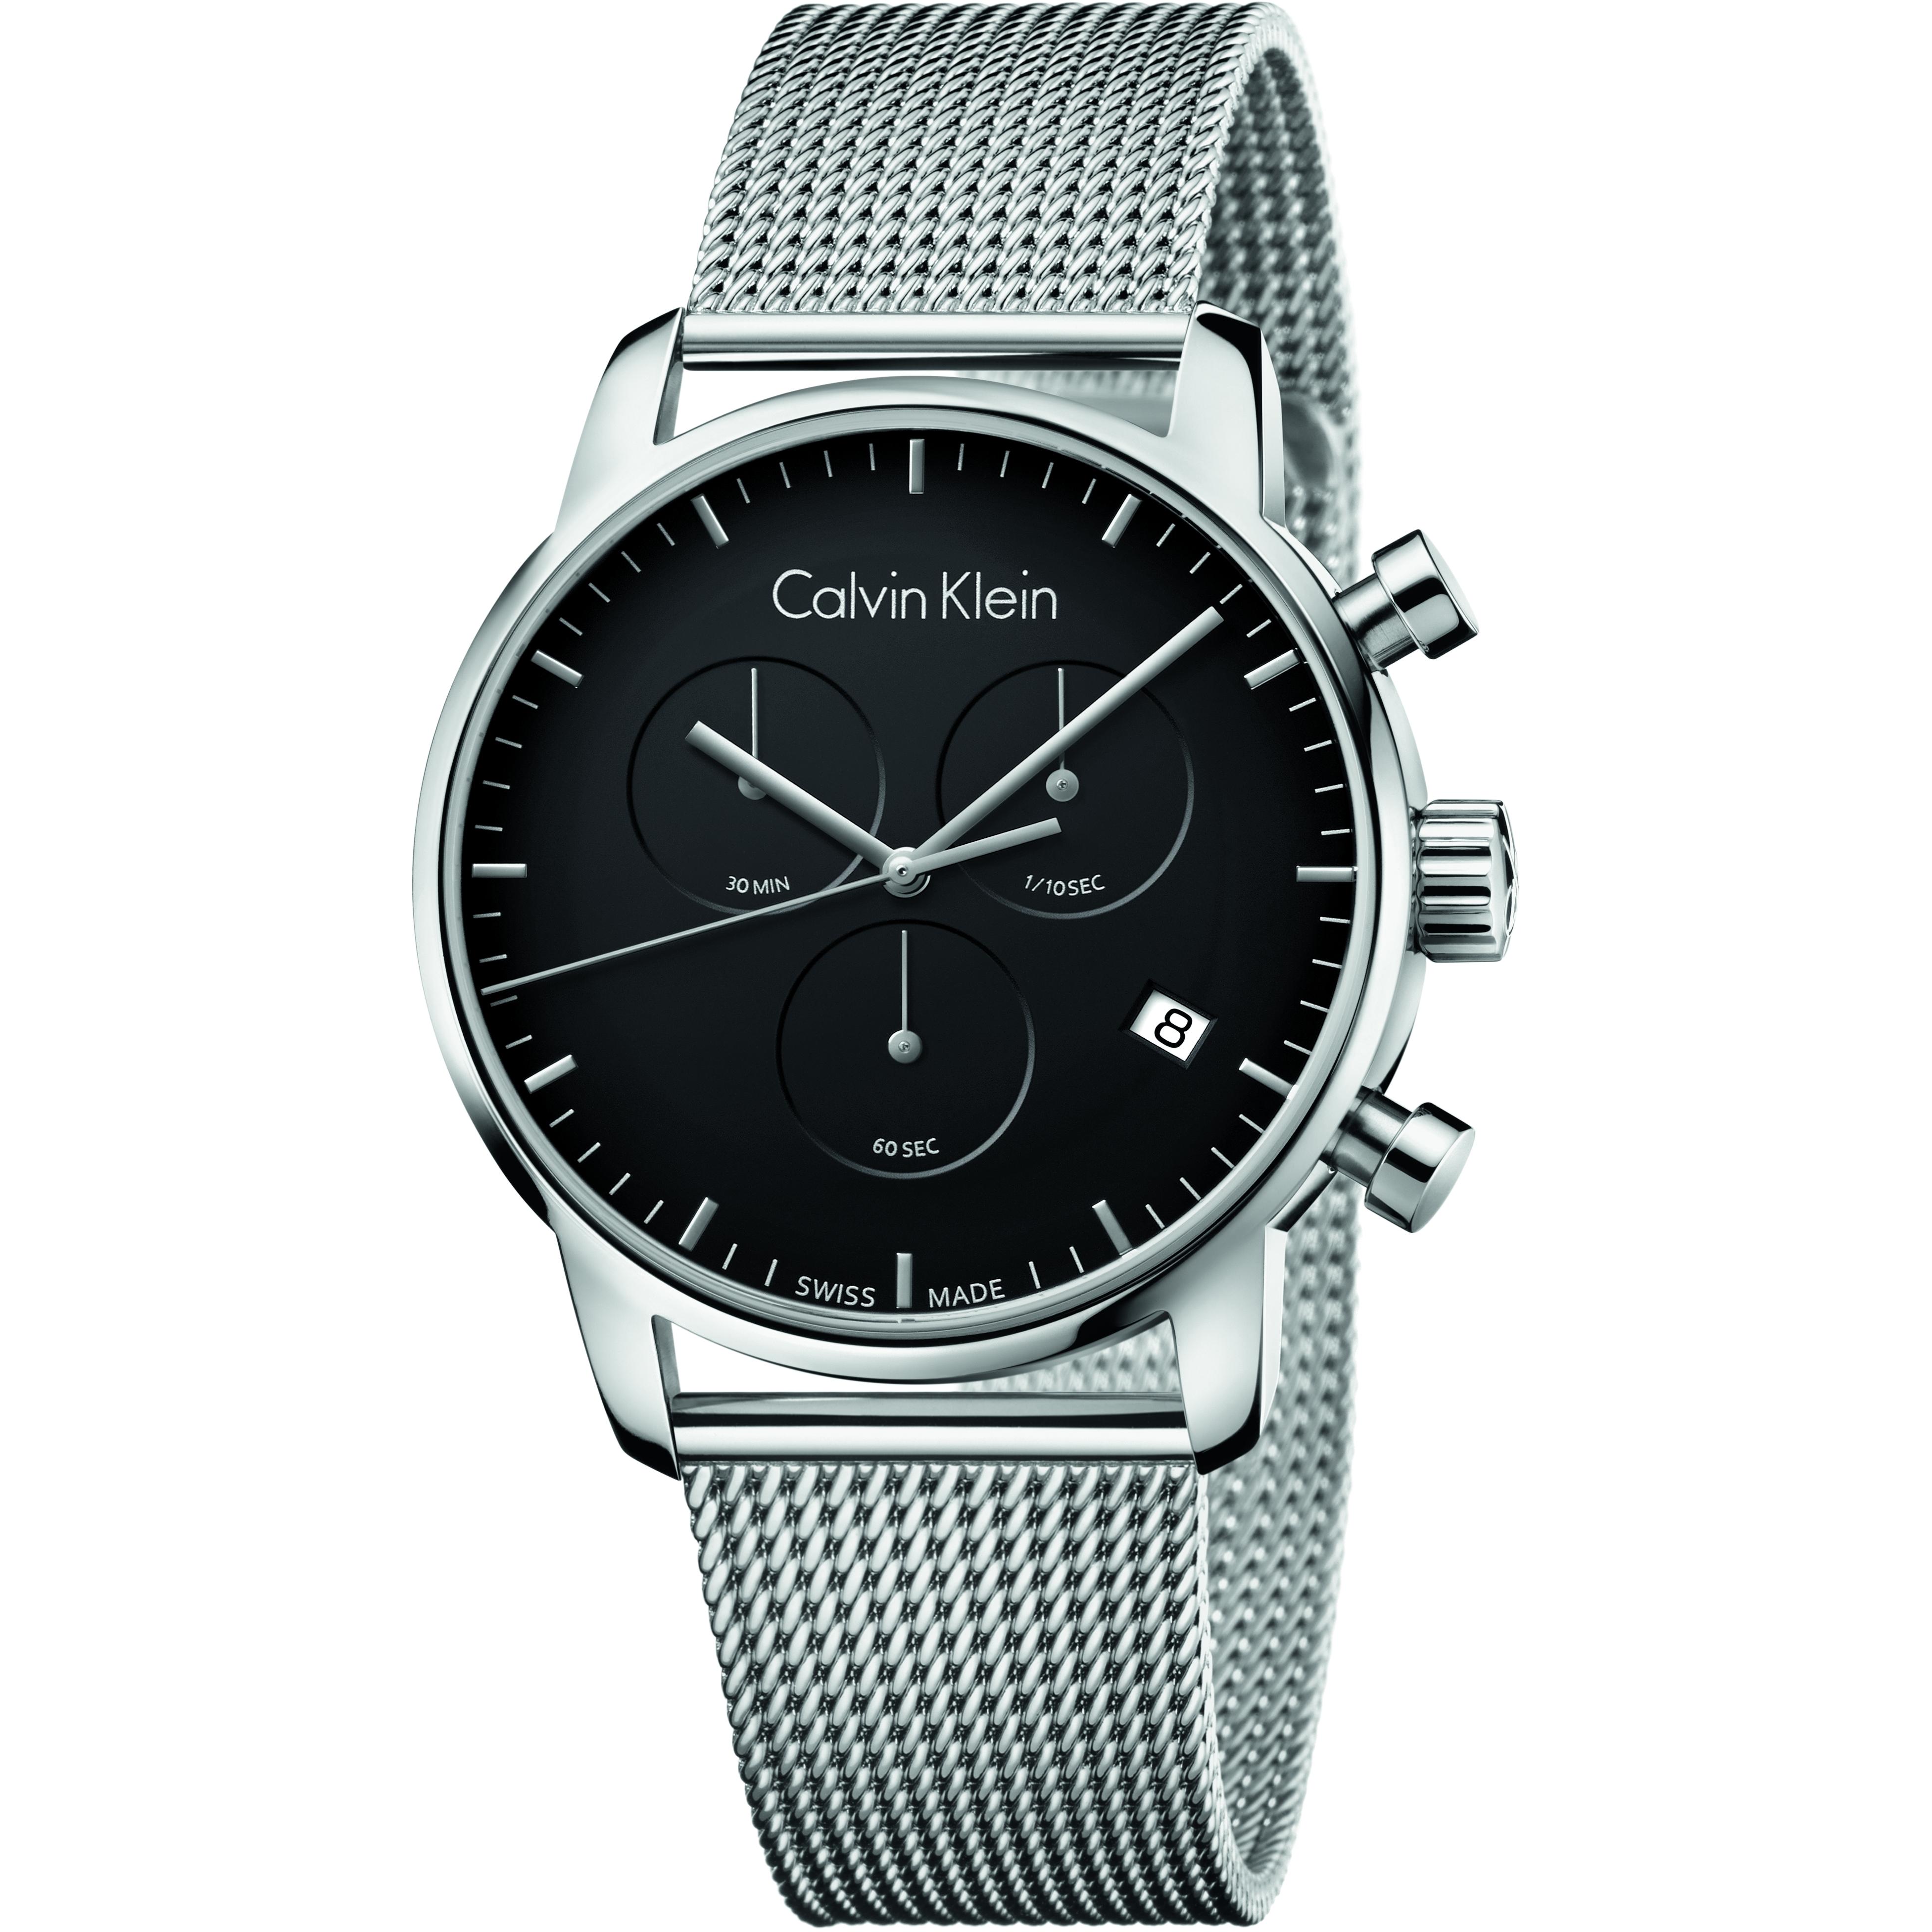 7df21e0b3 Gents Calvin Klein City Chronograph Watch (K2G27121) | WatchShop.com™